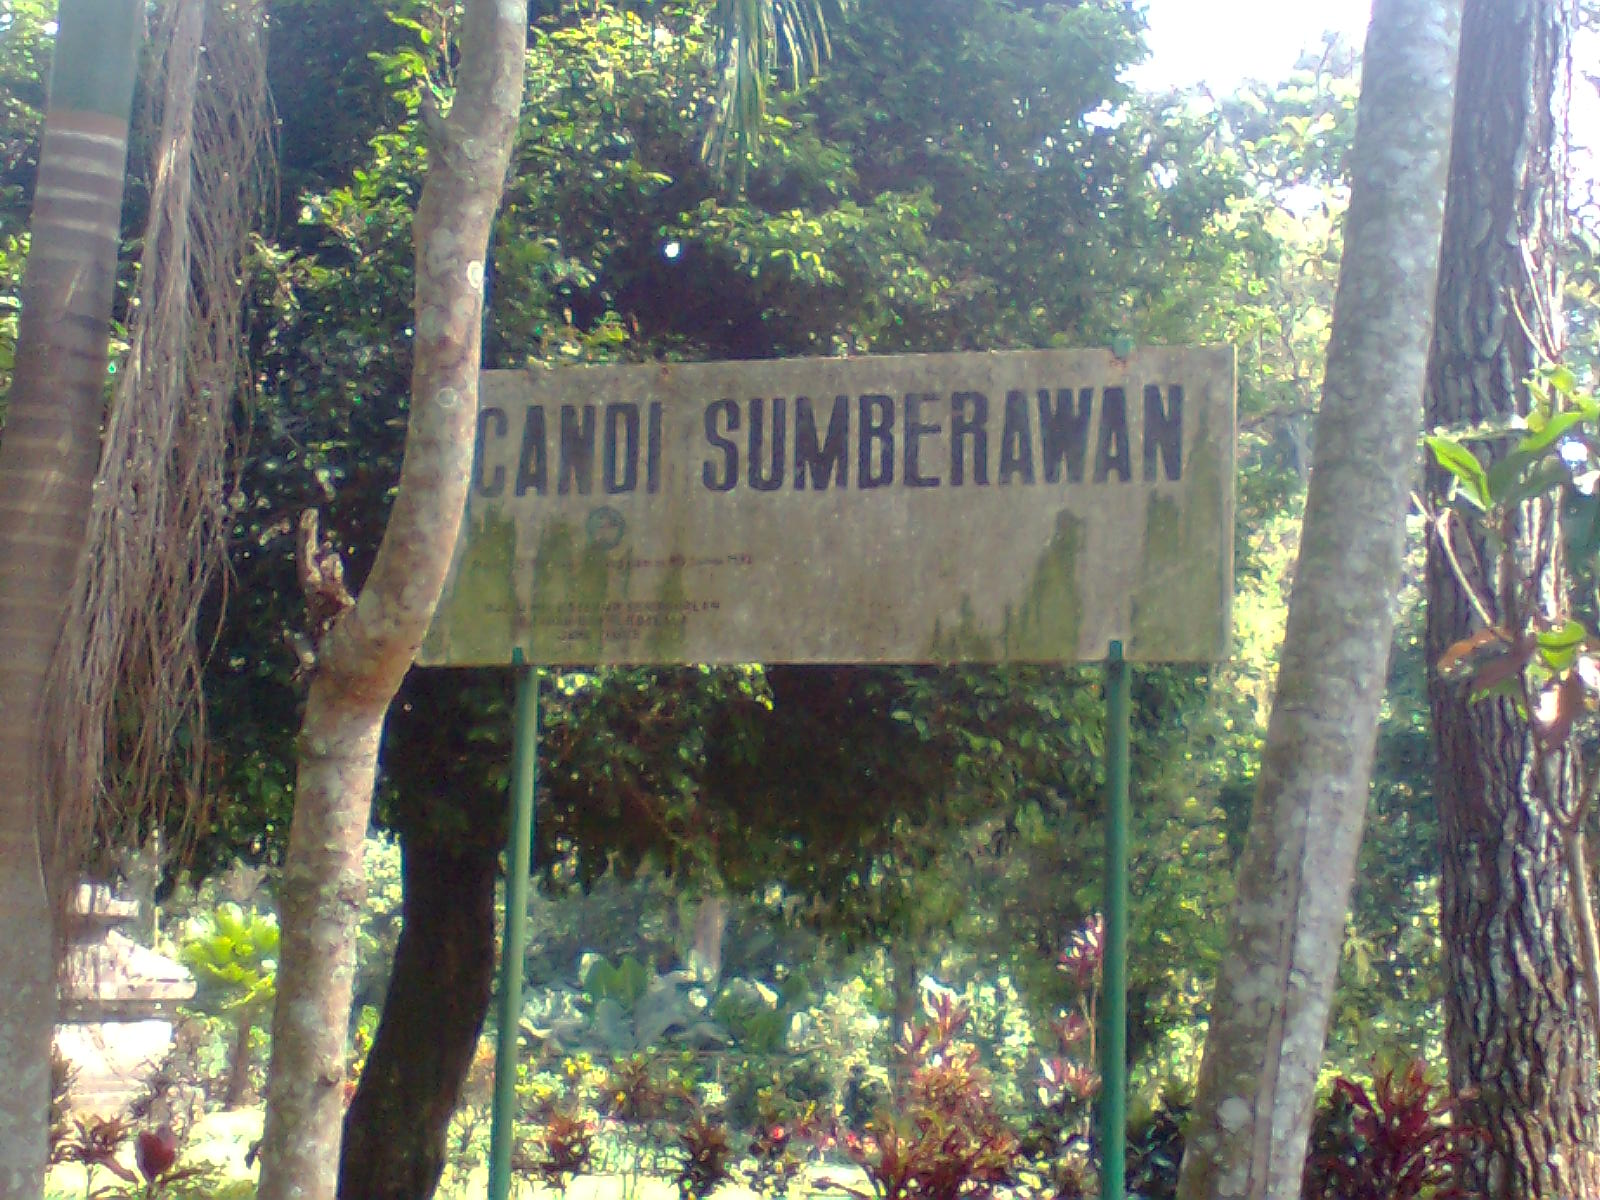 Situs Candi Sumberawan Malang Kota